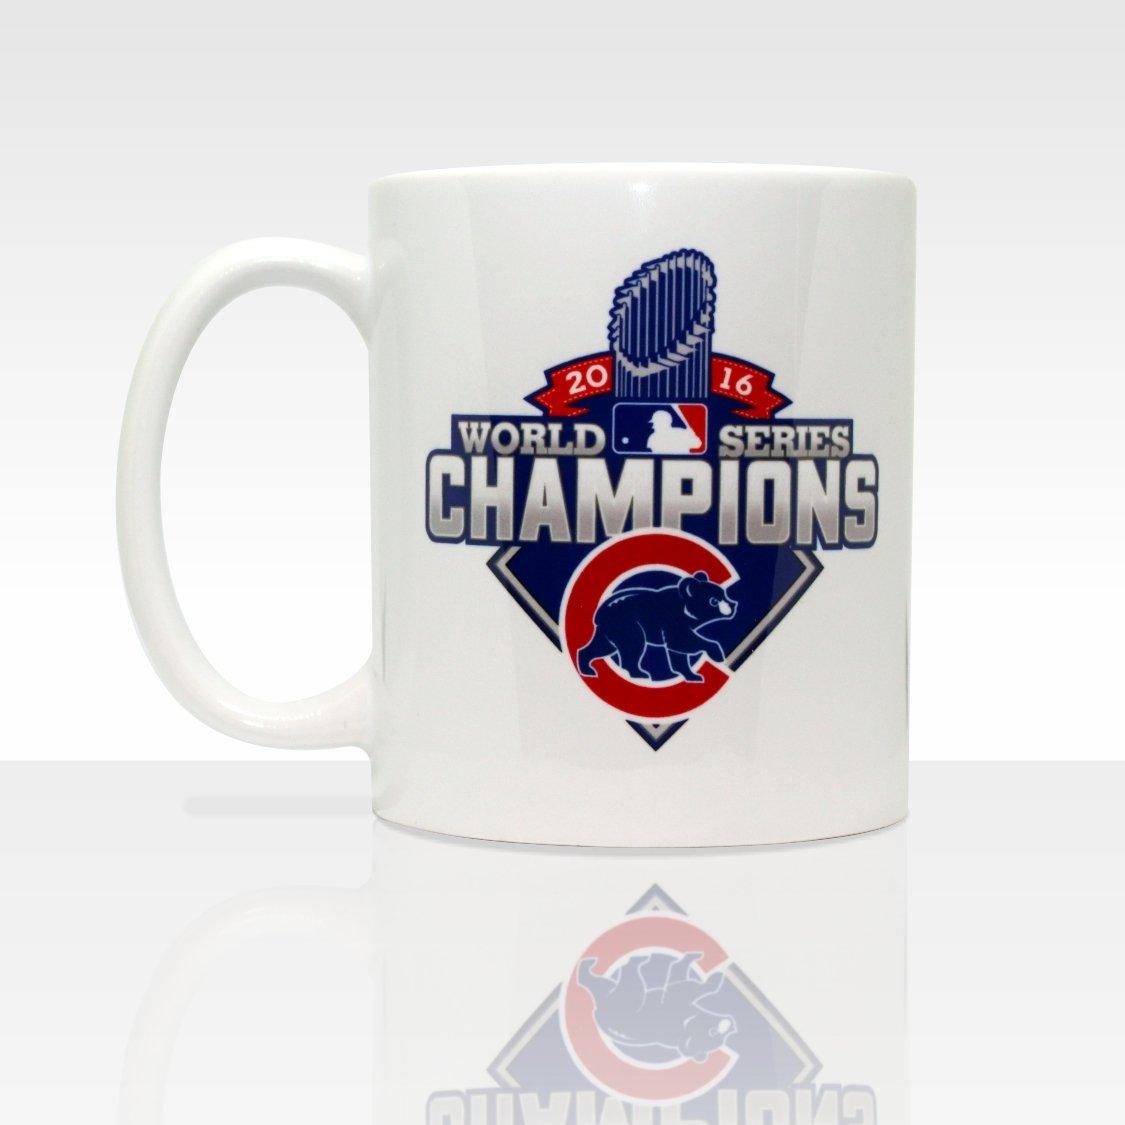 Amazon.com  Chicago Cubs World Series Champions 2016 11oz Ceramic Coffee Mug   Kitchen   Dining 4e70caa3d059